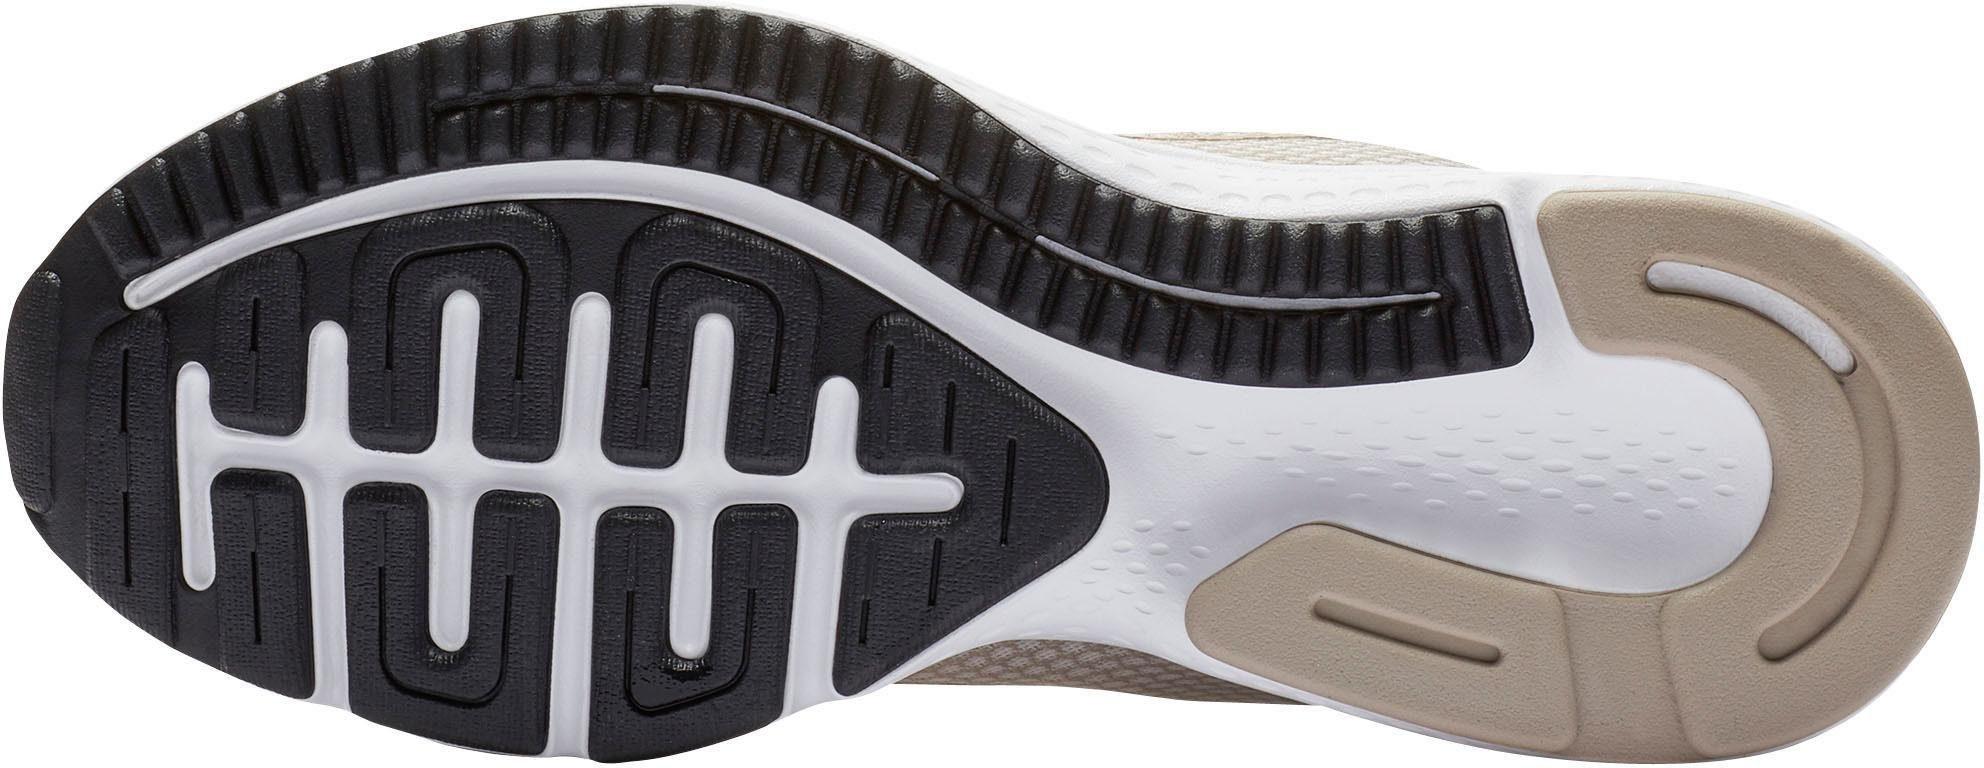 Laufschuh Nike Laufschuh Laufschuh Nike »wmns Runallday« Nike Nike »wmns Laufschuh »wmns »wmns Runallday« Runallday« Runallday« IpFv6A